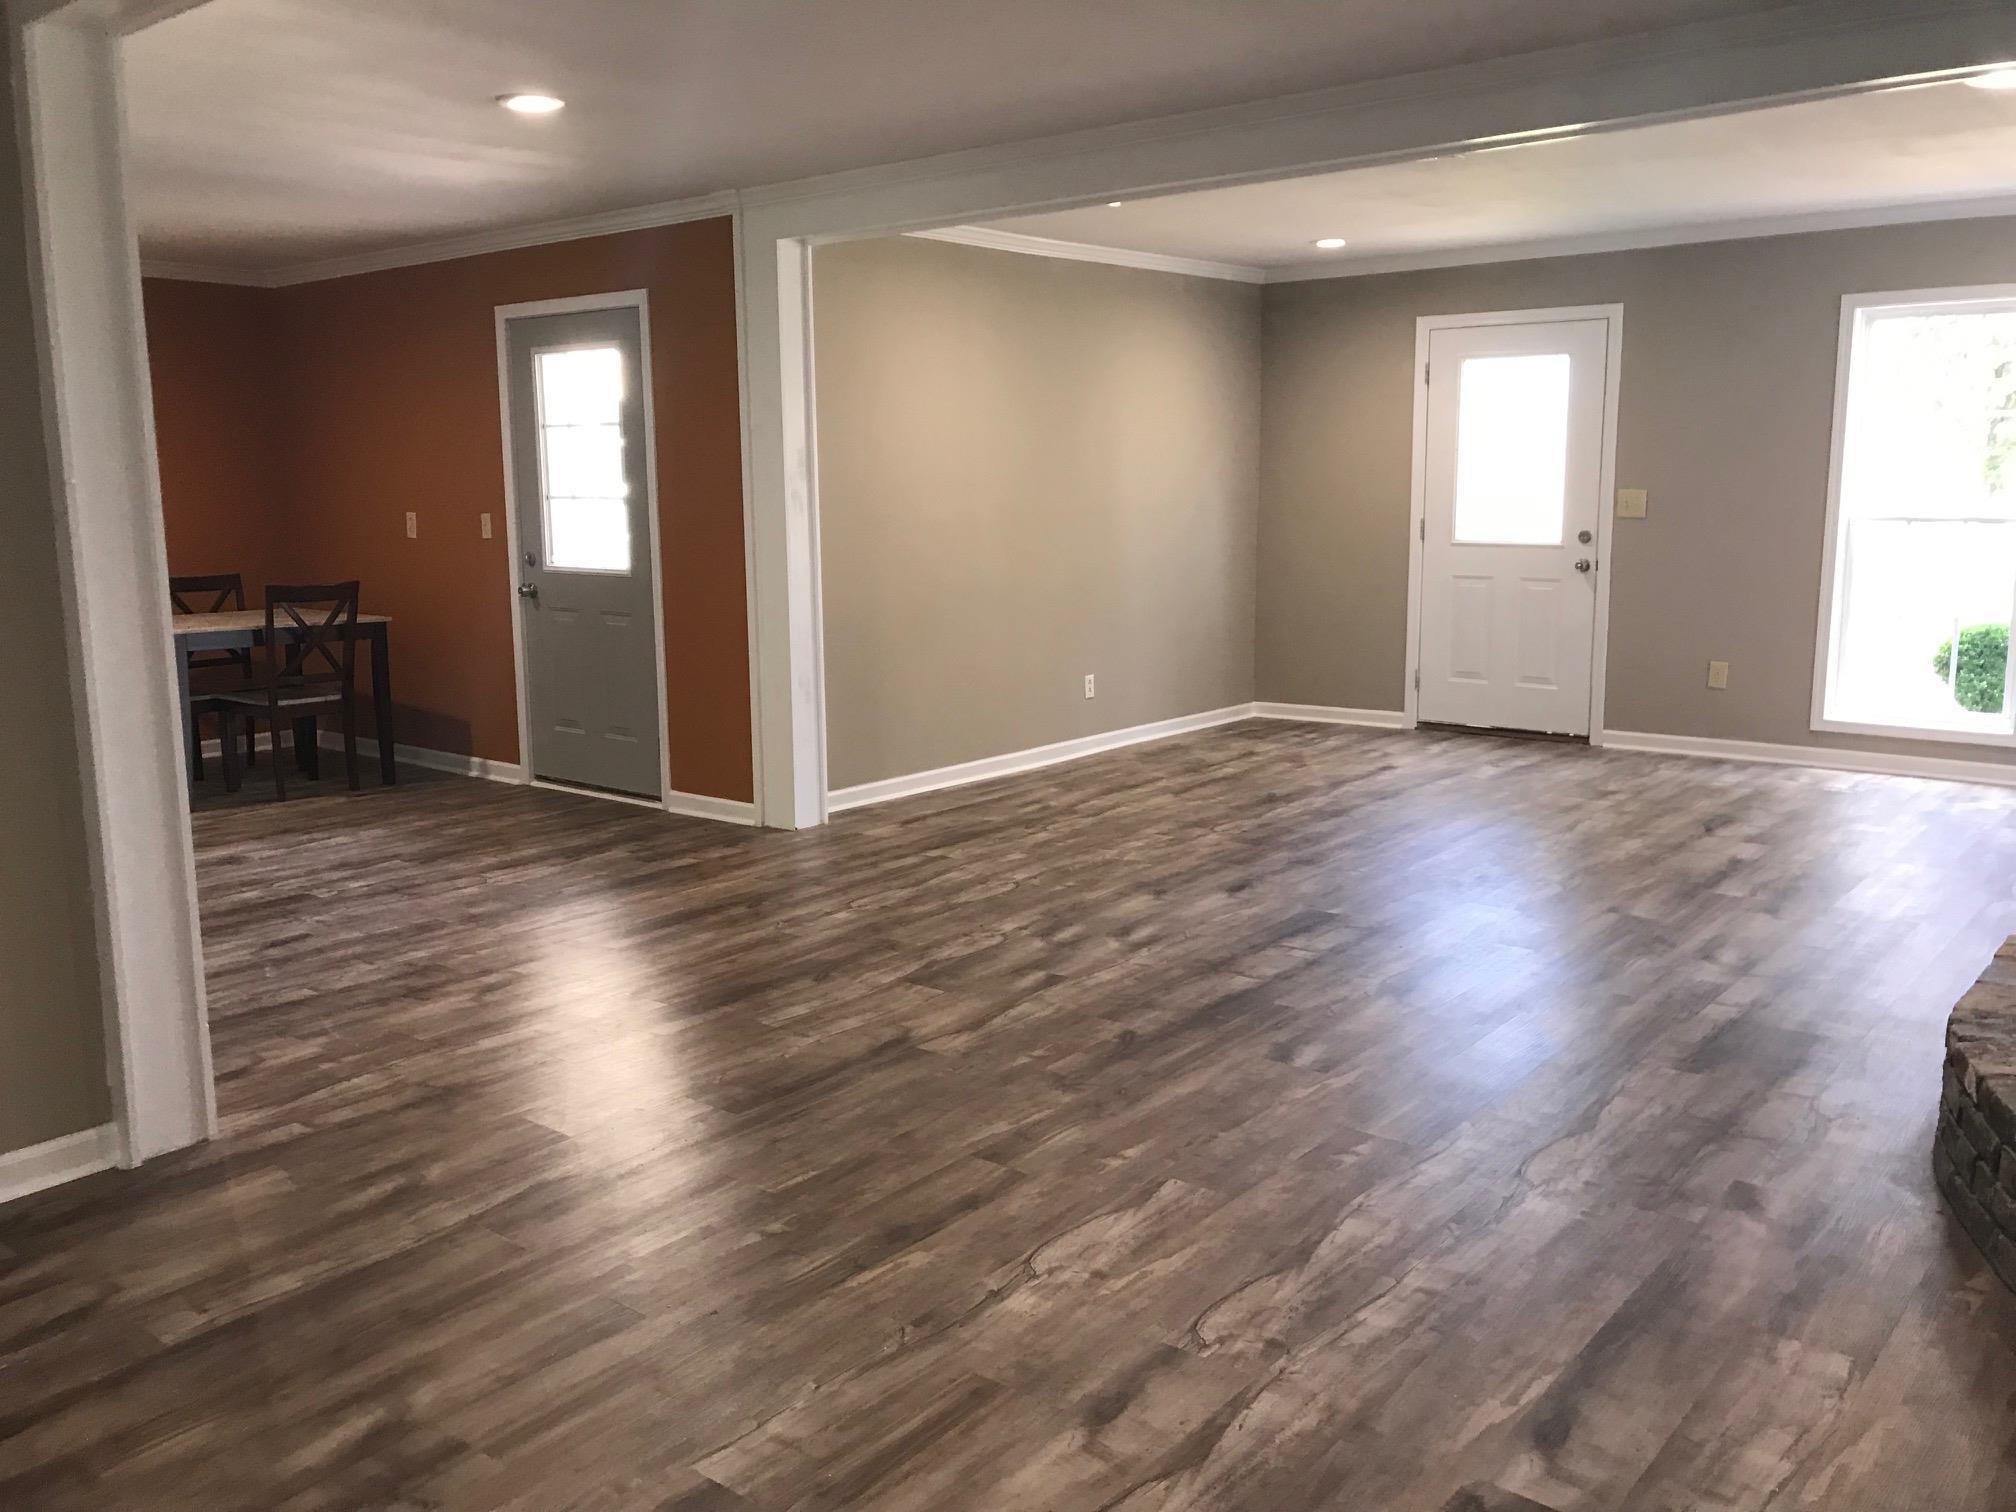 1582 Cook Rd, Tullahoma, TN 37388 - Tullahoma, TN real estate listing